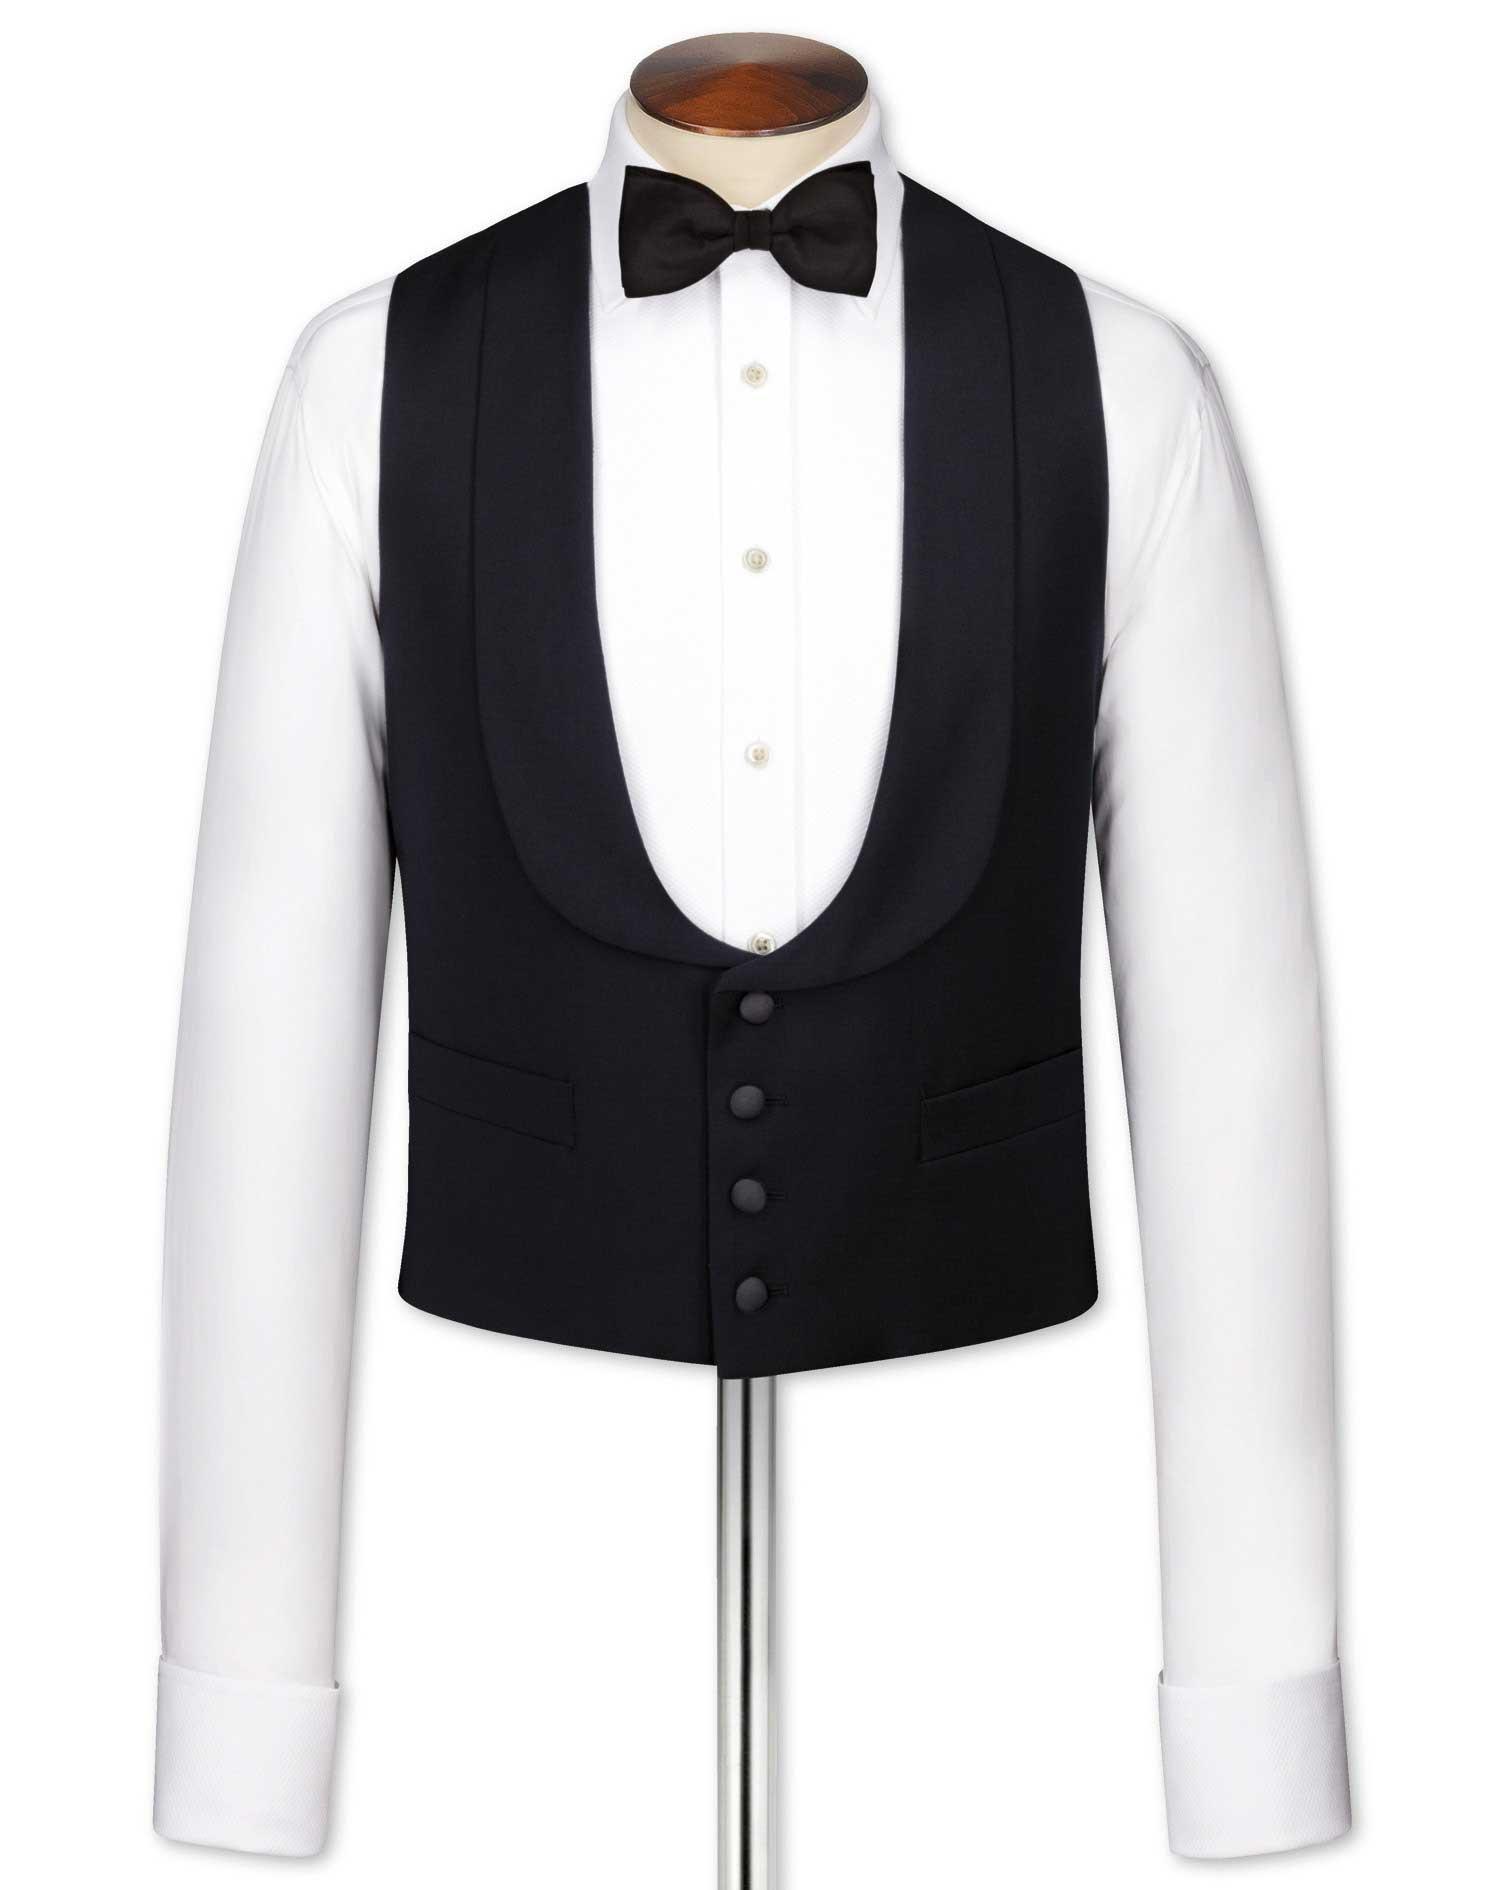 Black Adjustable Fit Shawl Collar Tuxedo Wool Waistcoat Size w46 by Charles Tyrwhitt